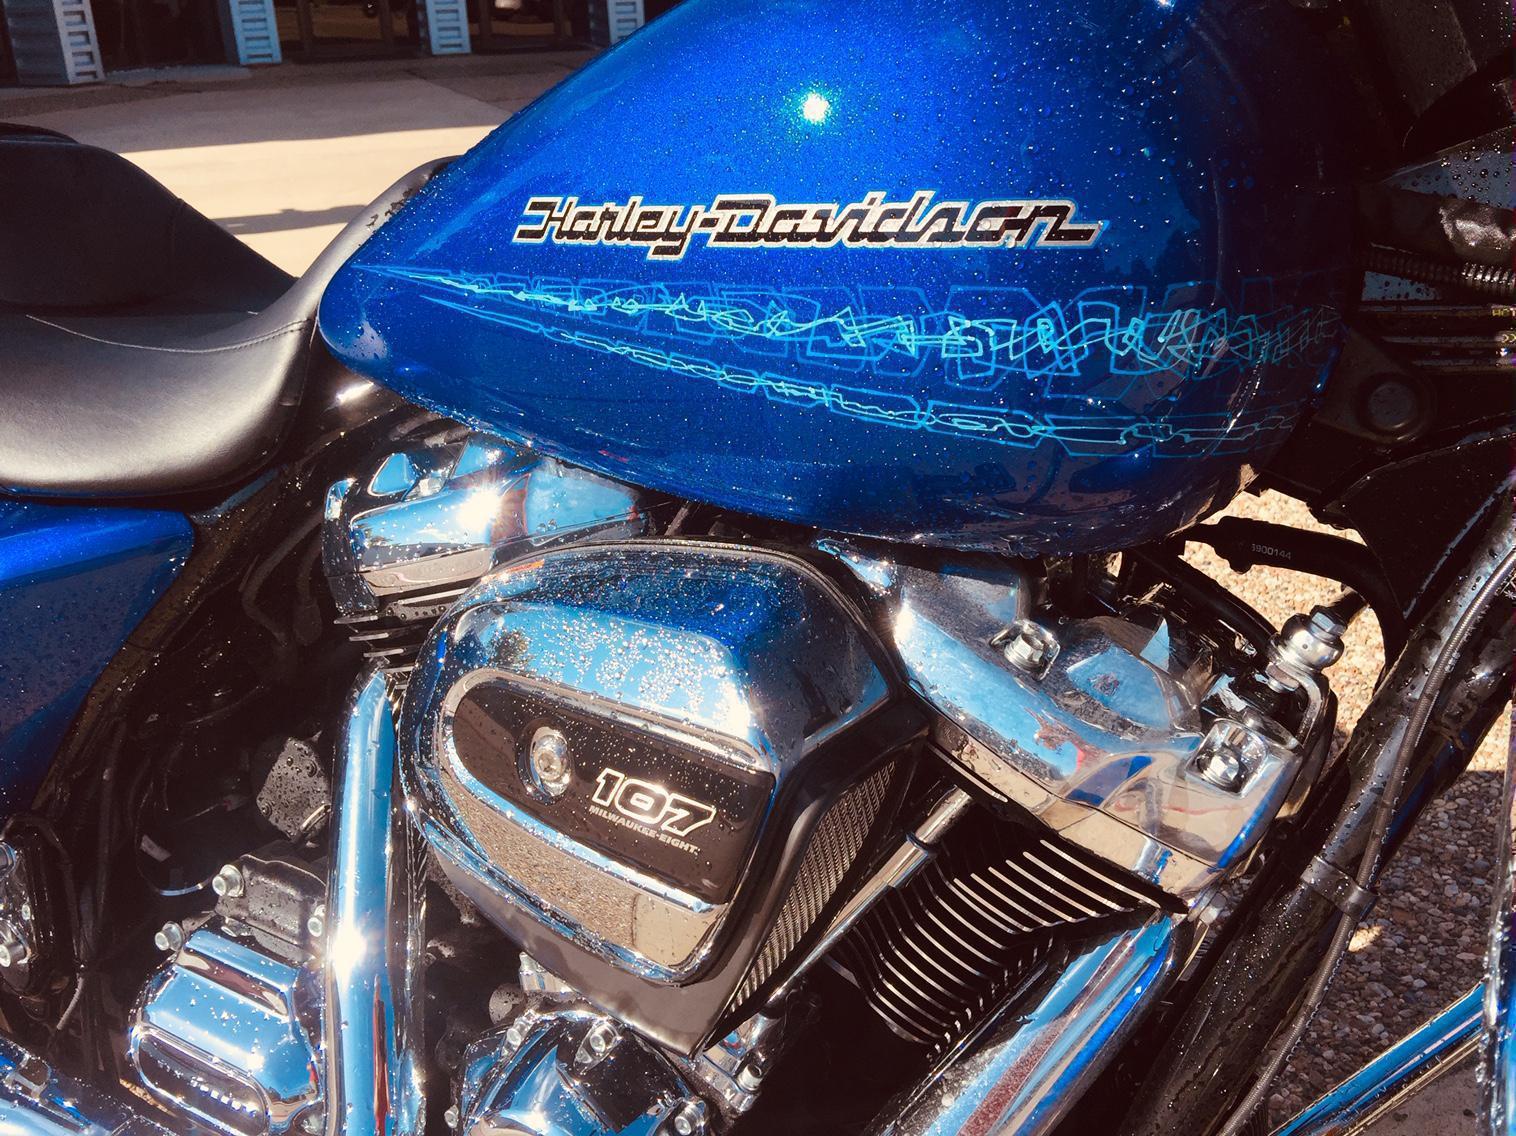 2019 Harley-Davidson® STREET GLIDE